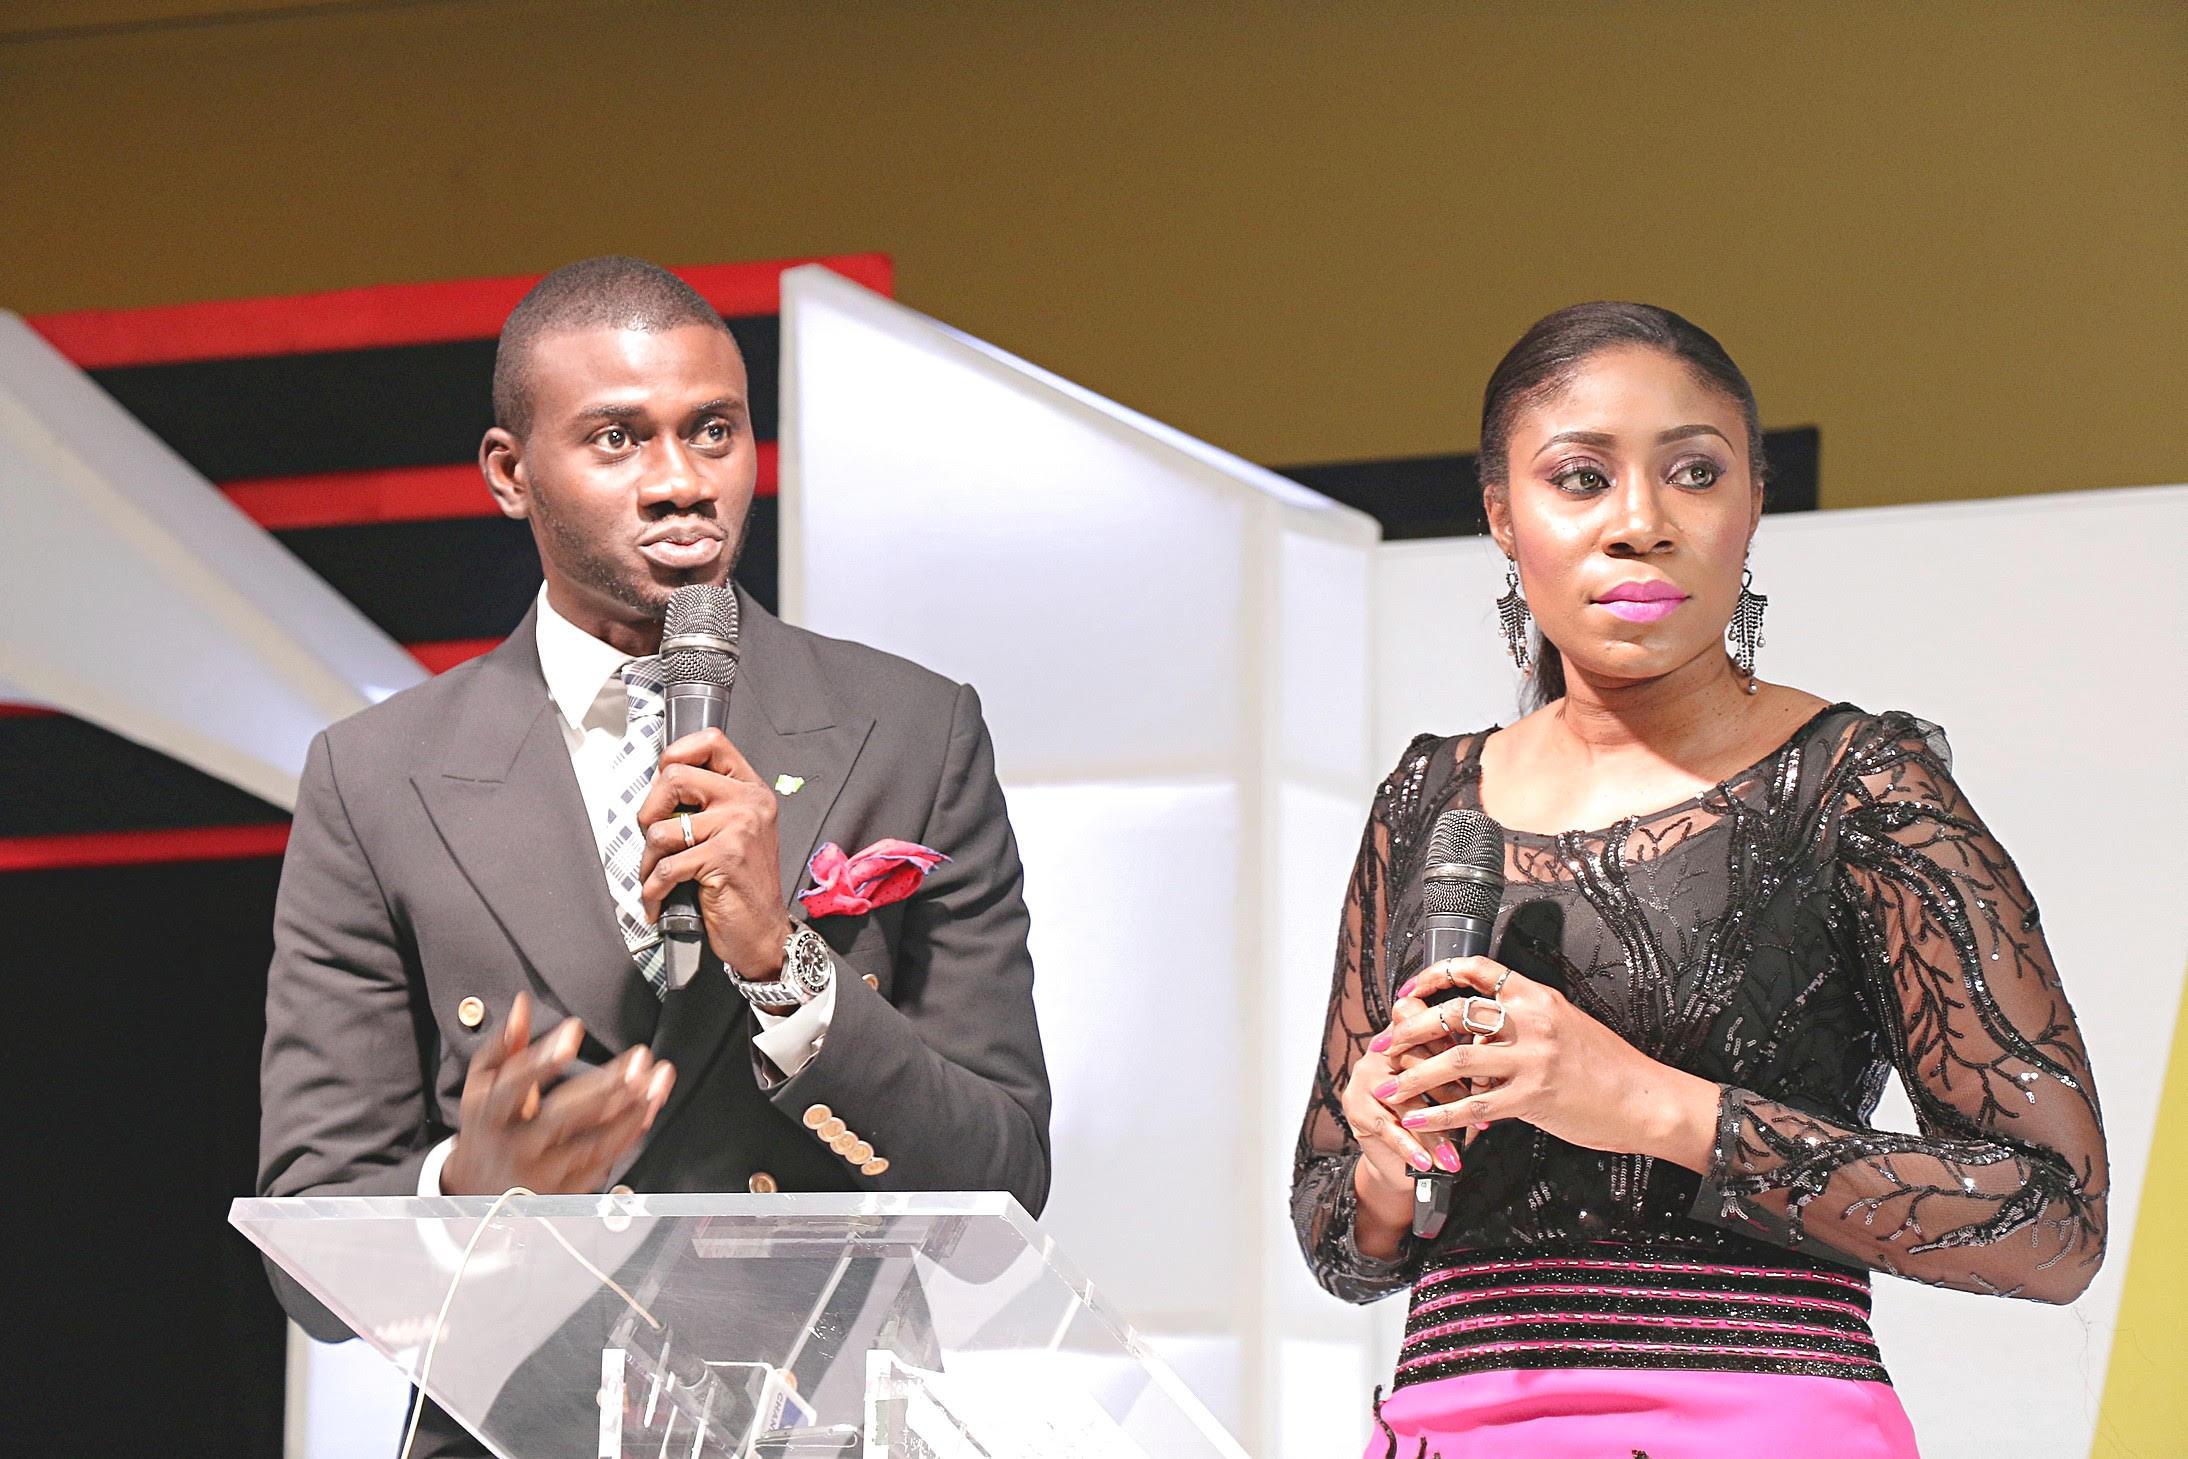 MCs Segun Dangote and Kayla Oniwo